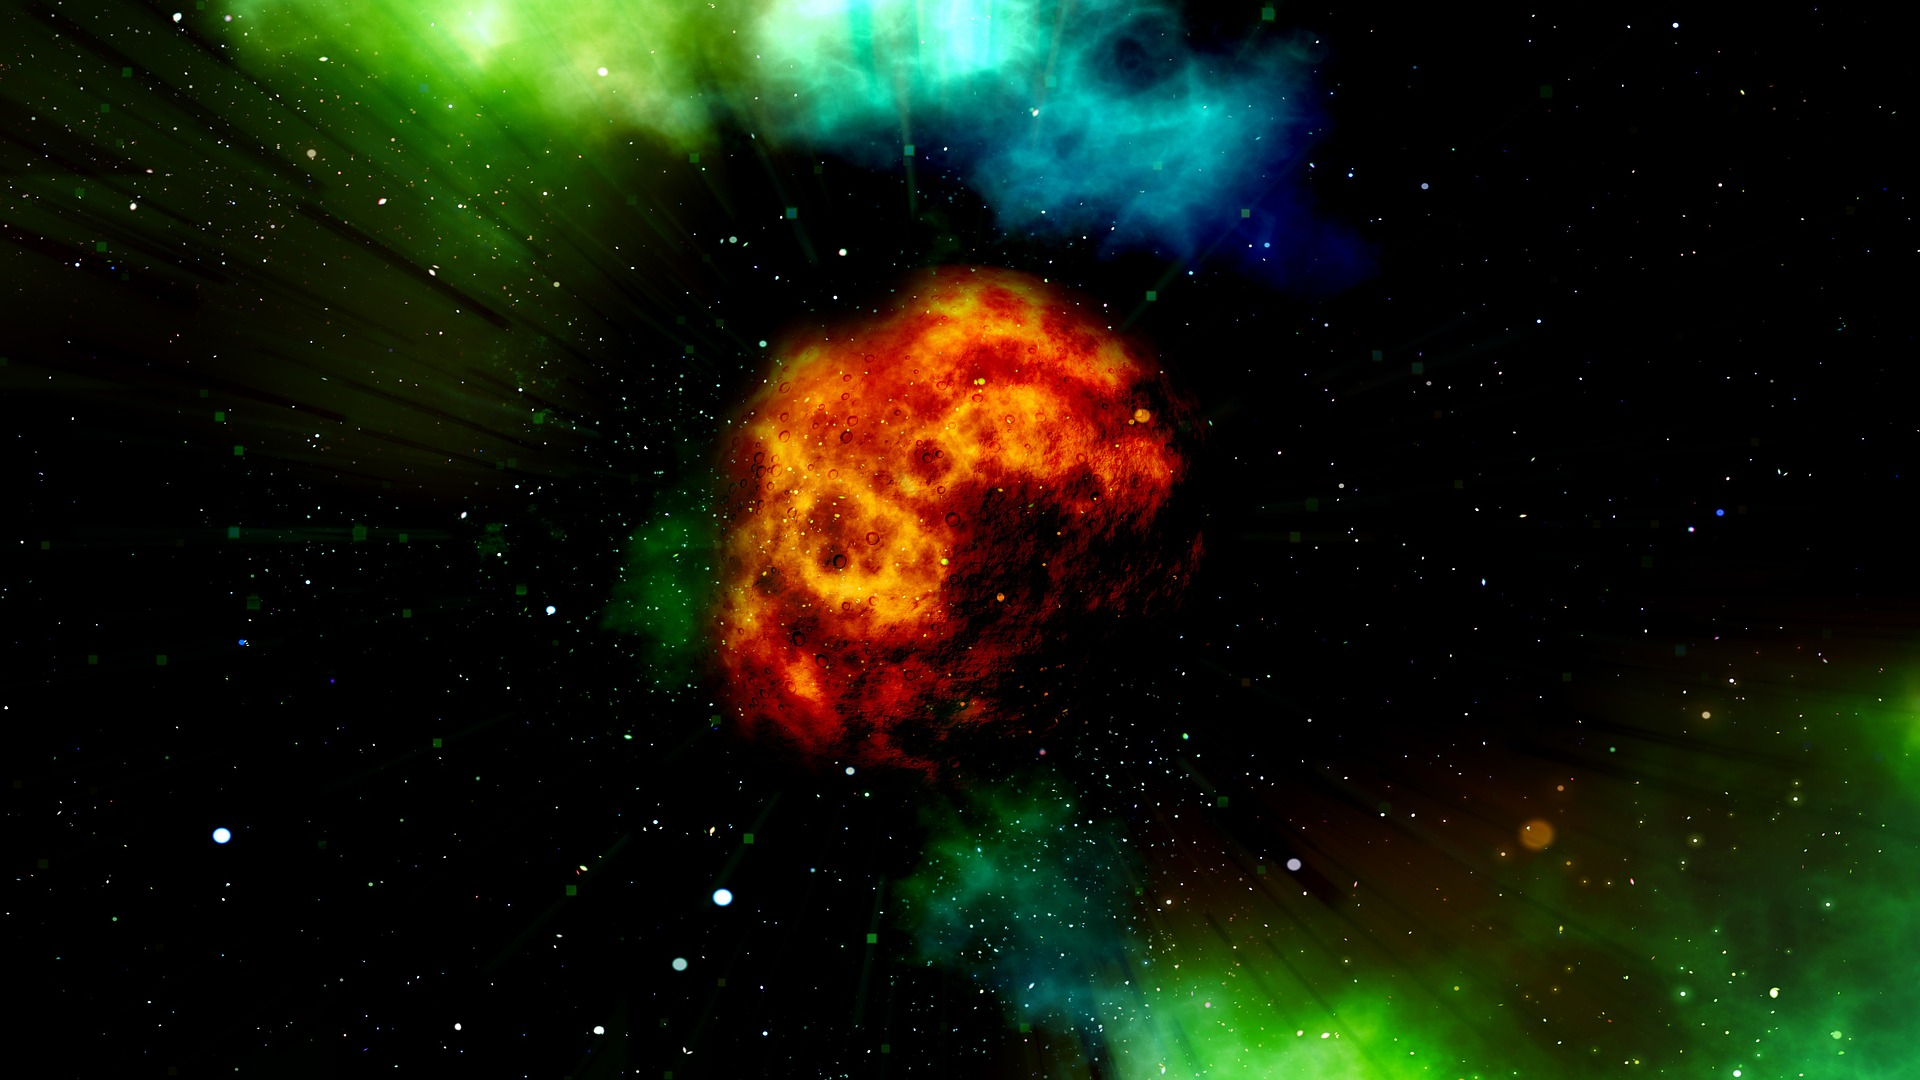 «Открылась бездна, звезд полна», или Ловец метеоритов